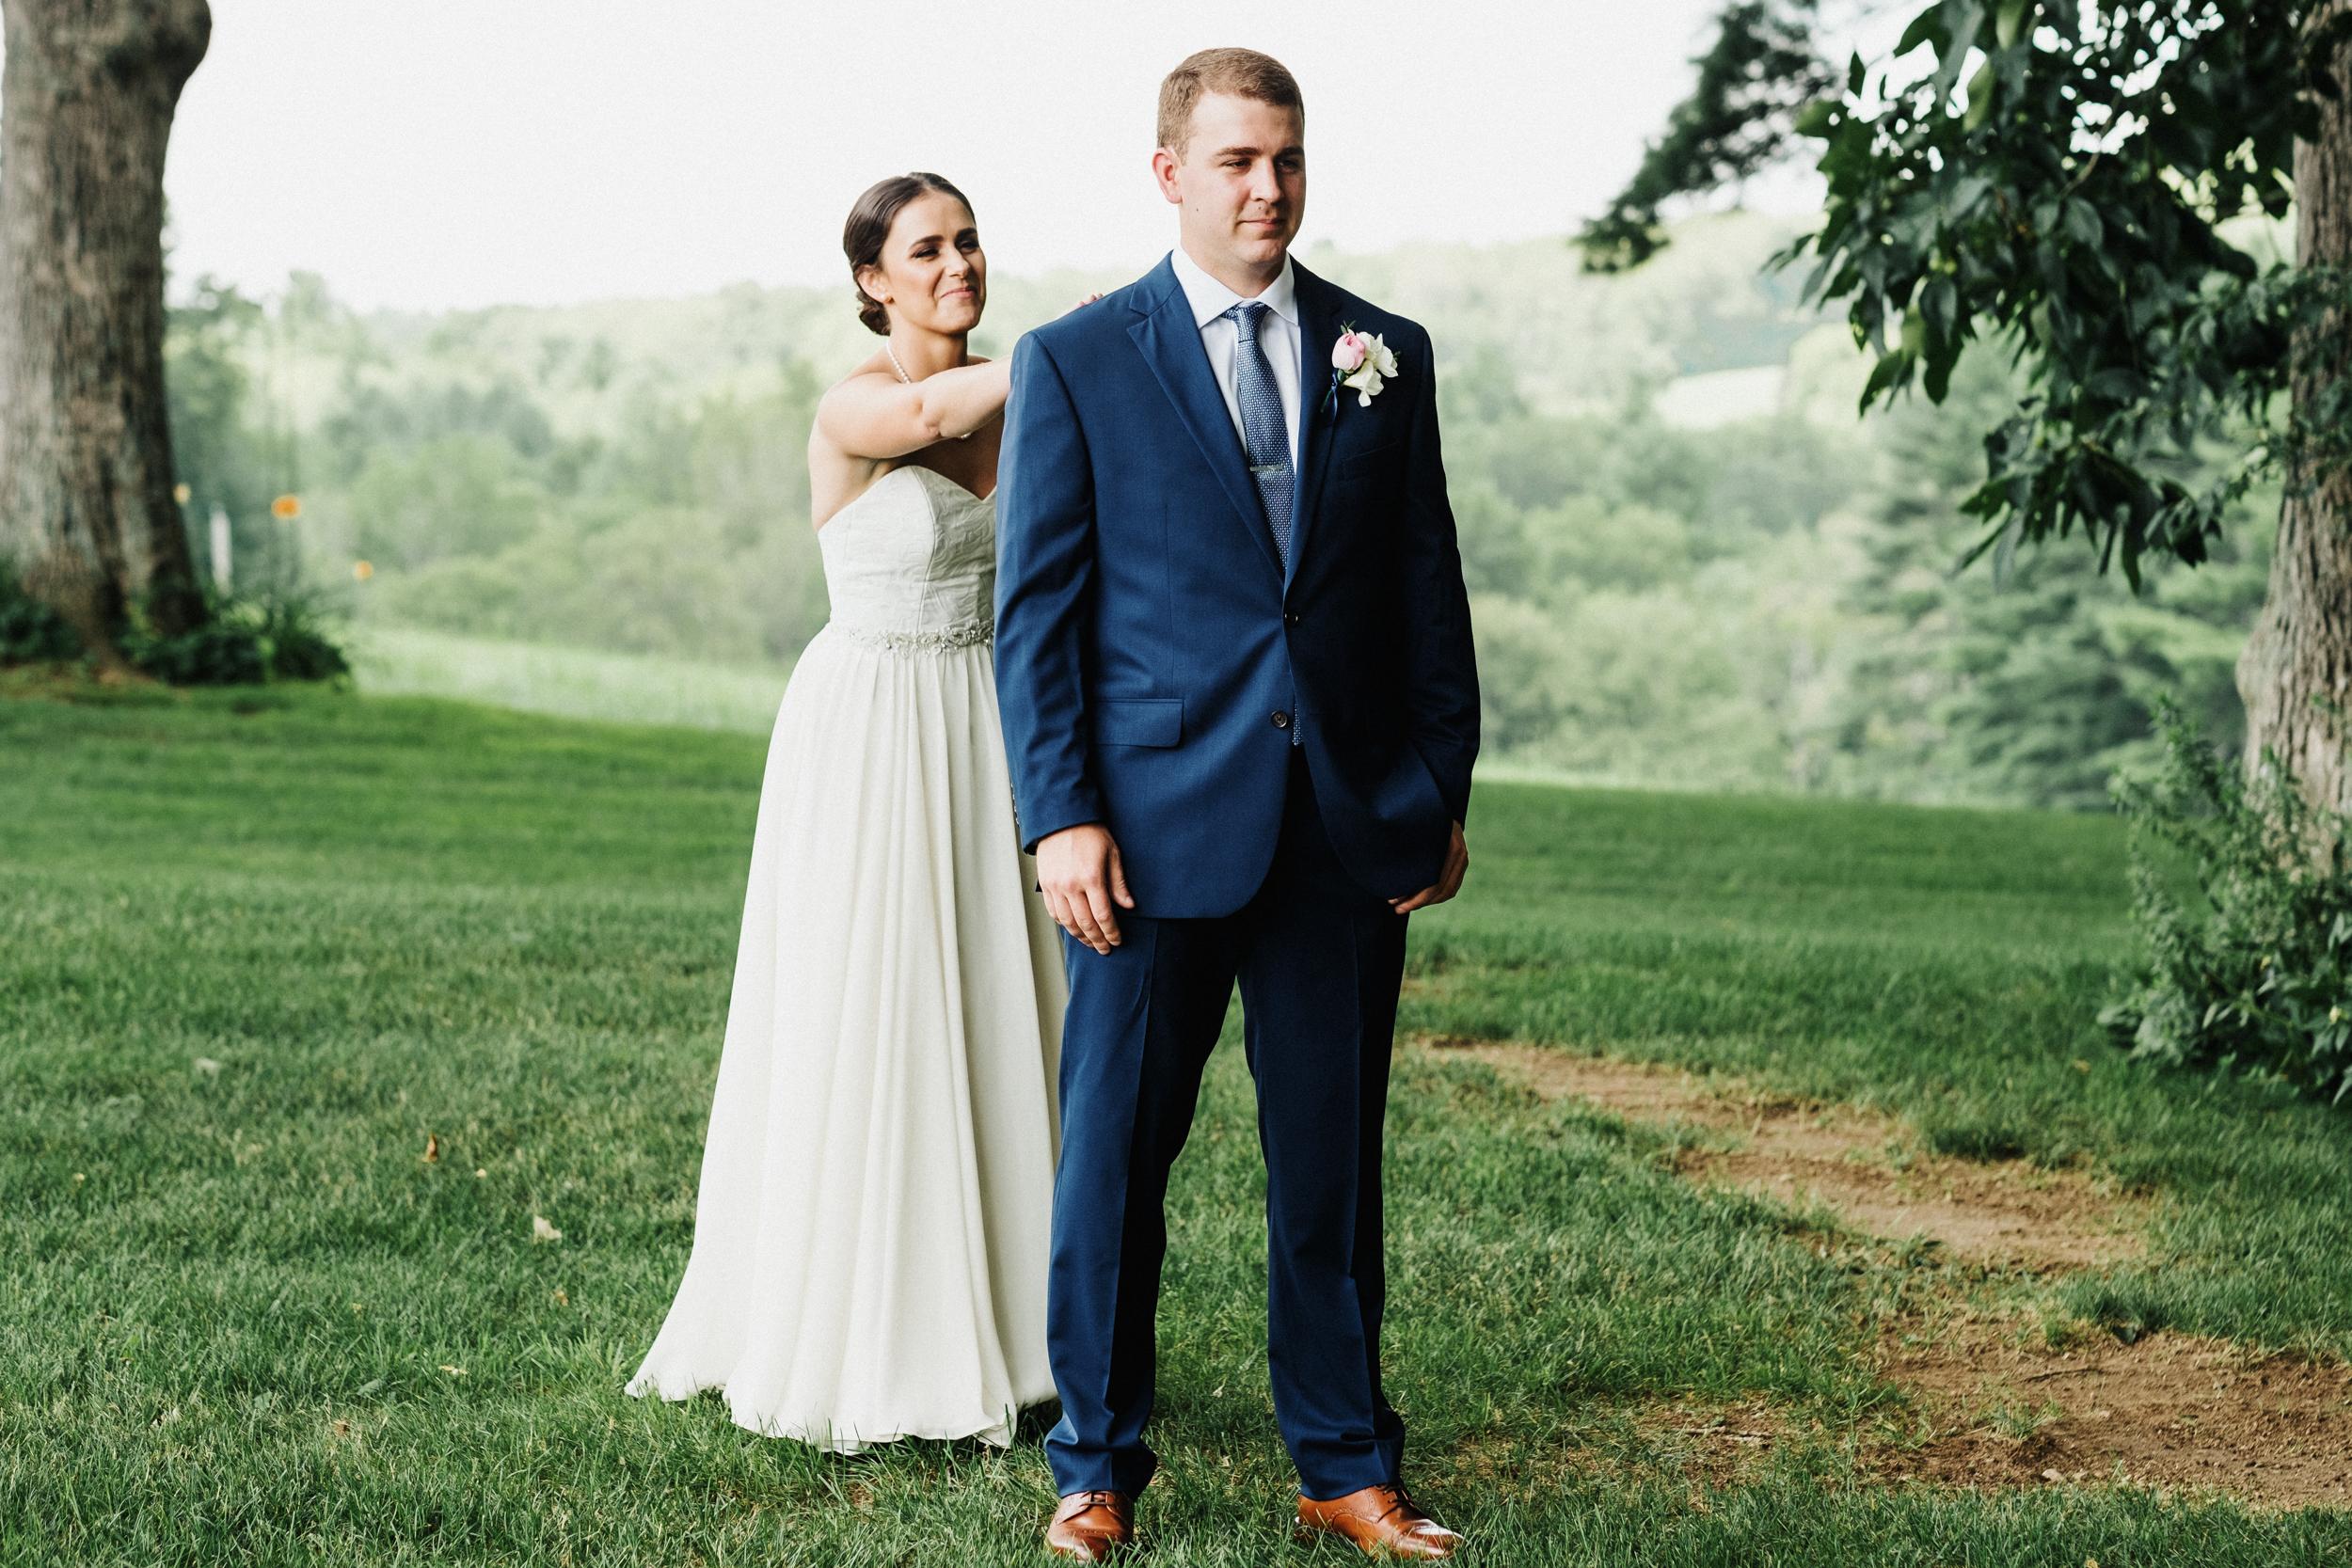 Wedding_Francis_Boucher_zukas_farm_2018-20.jpg